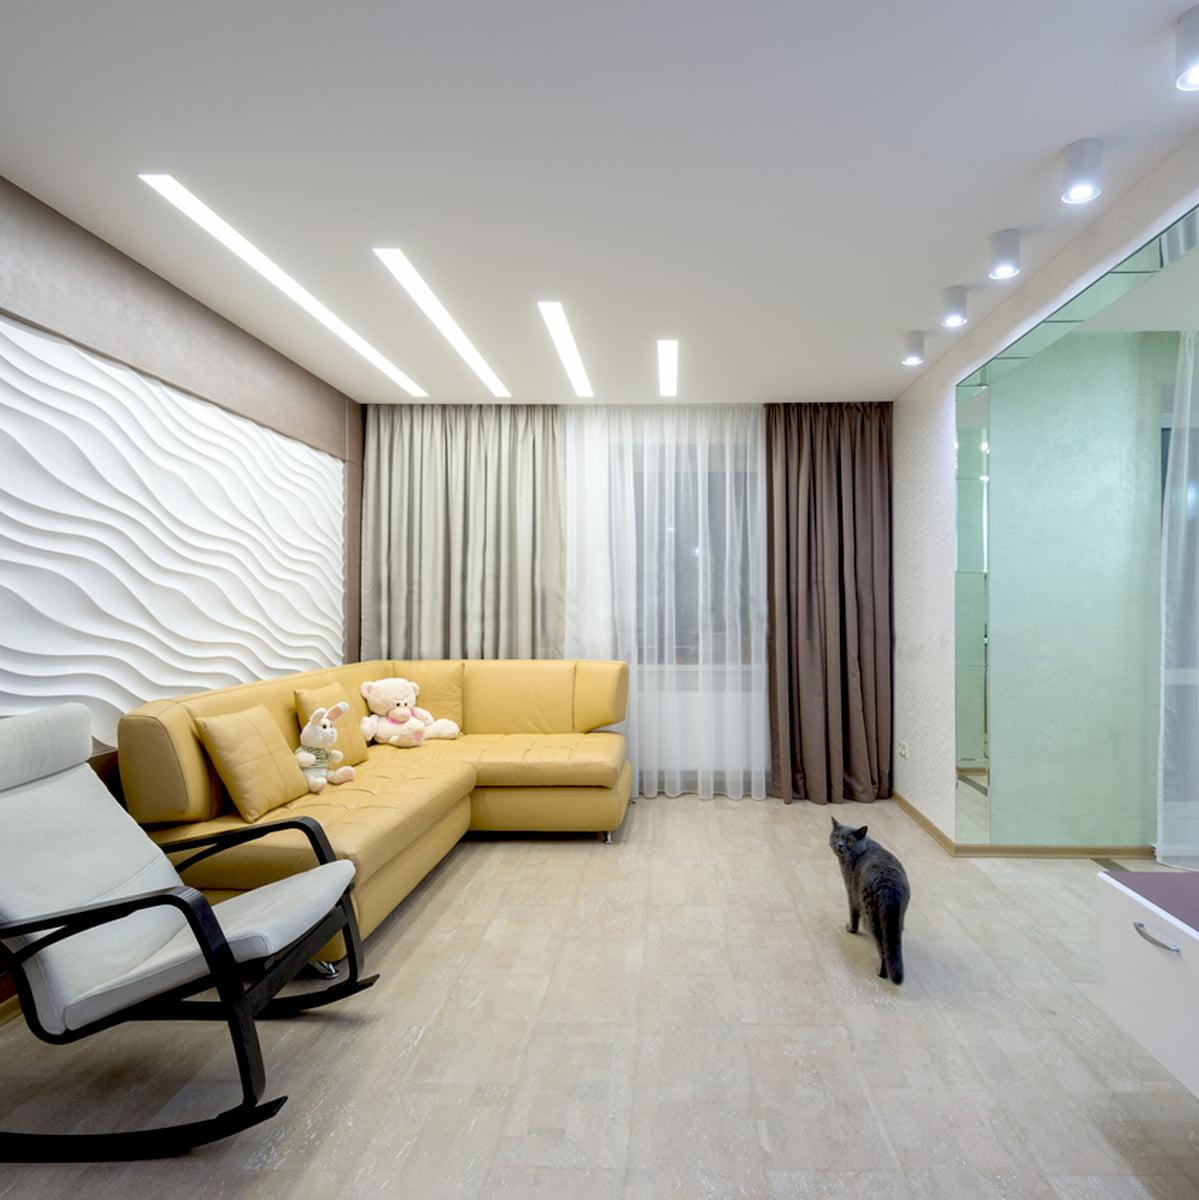 Потолок для квартиры #10